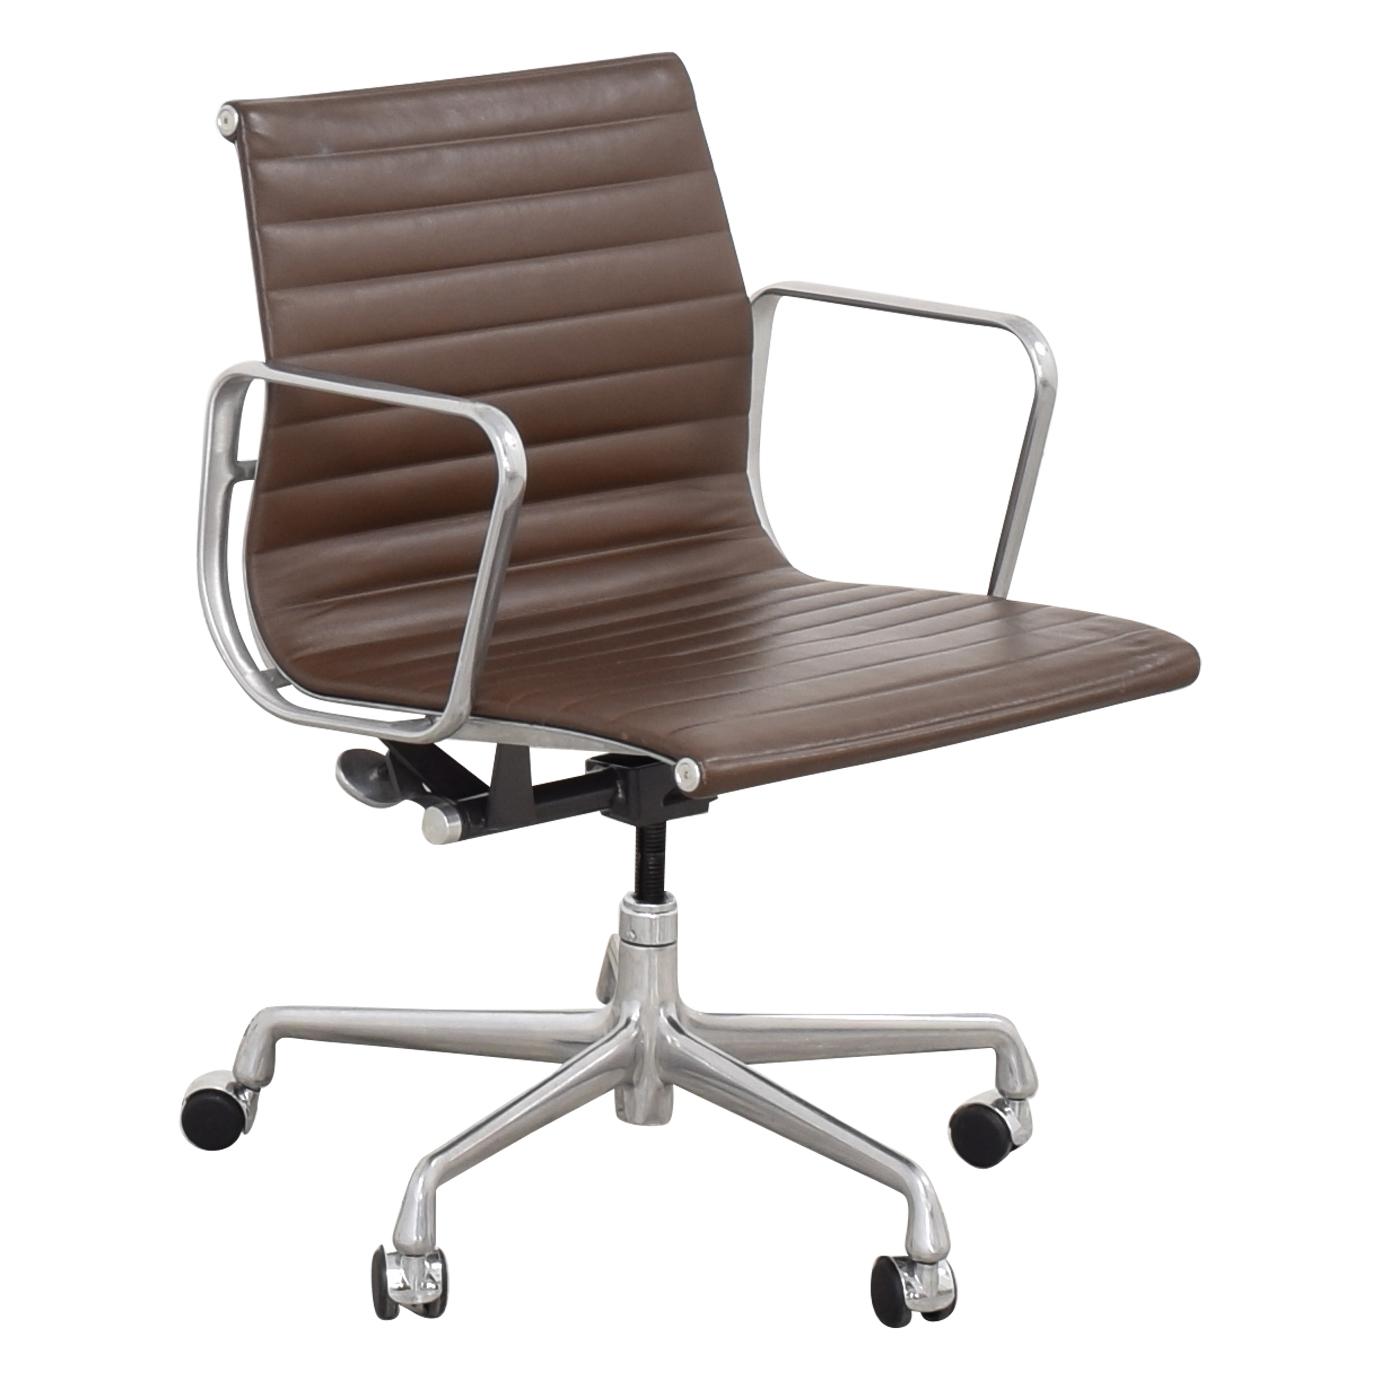 Herman Miller Herman Miller Eames Aluminum Group Management Chair dimensions